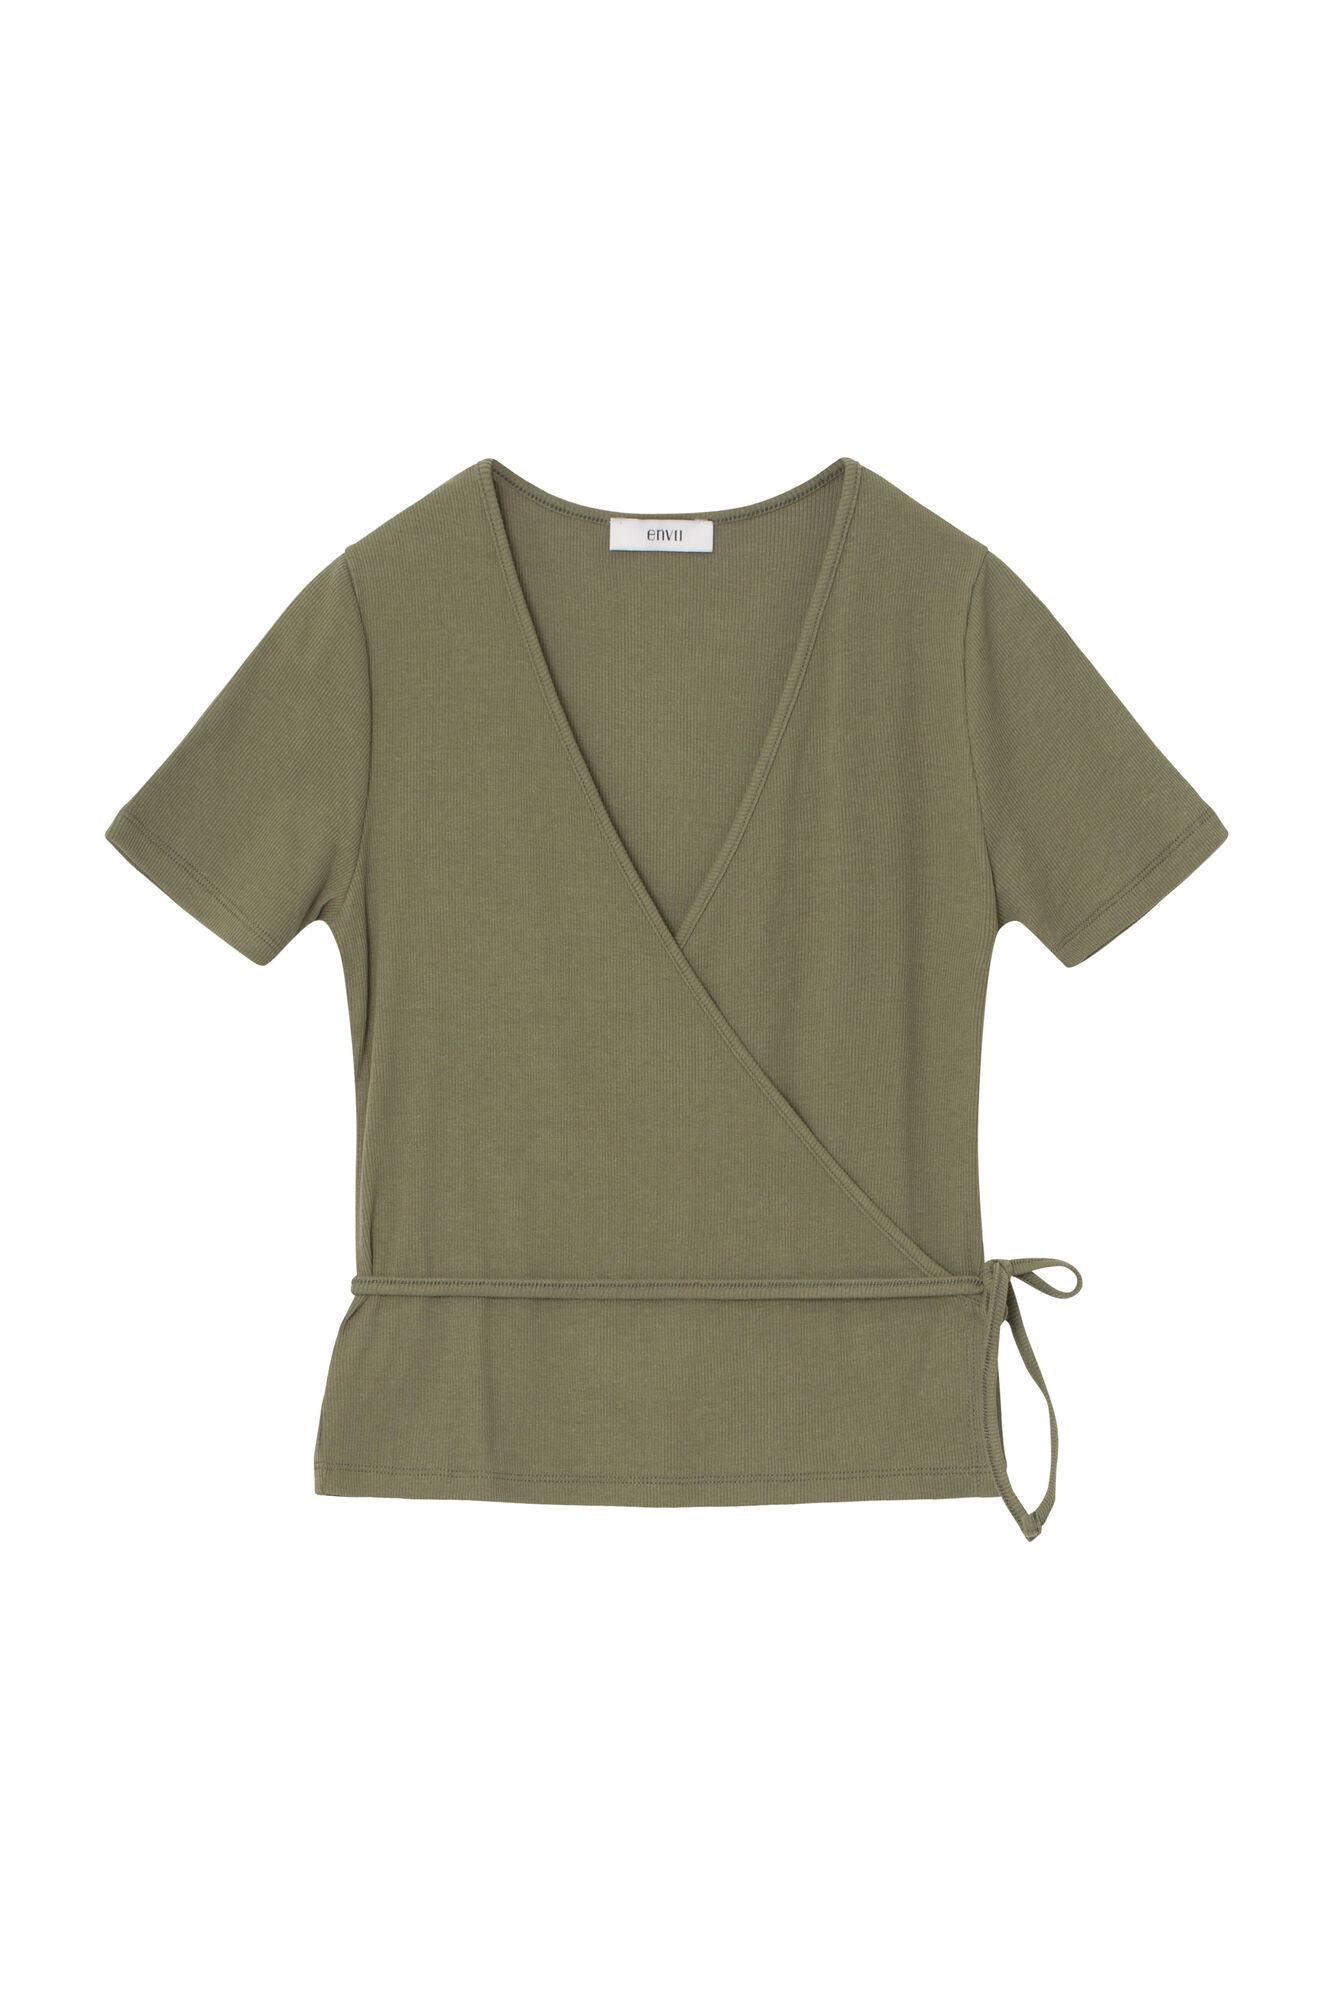 Envii Enally t-shirt, deep lichen green, x-small